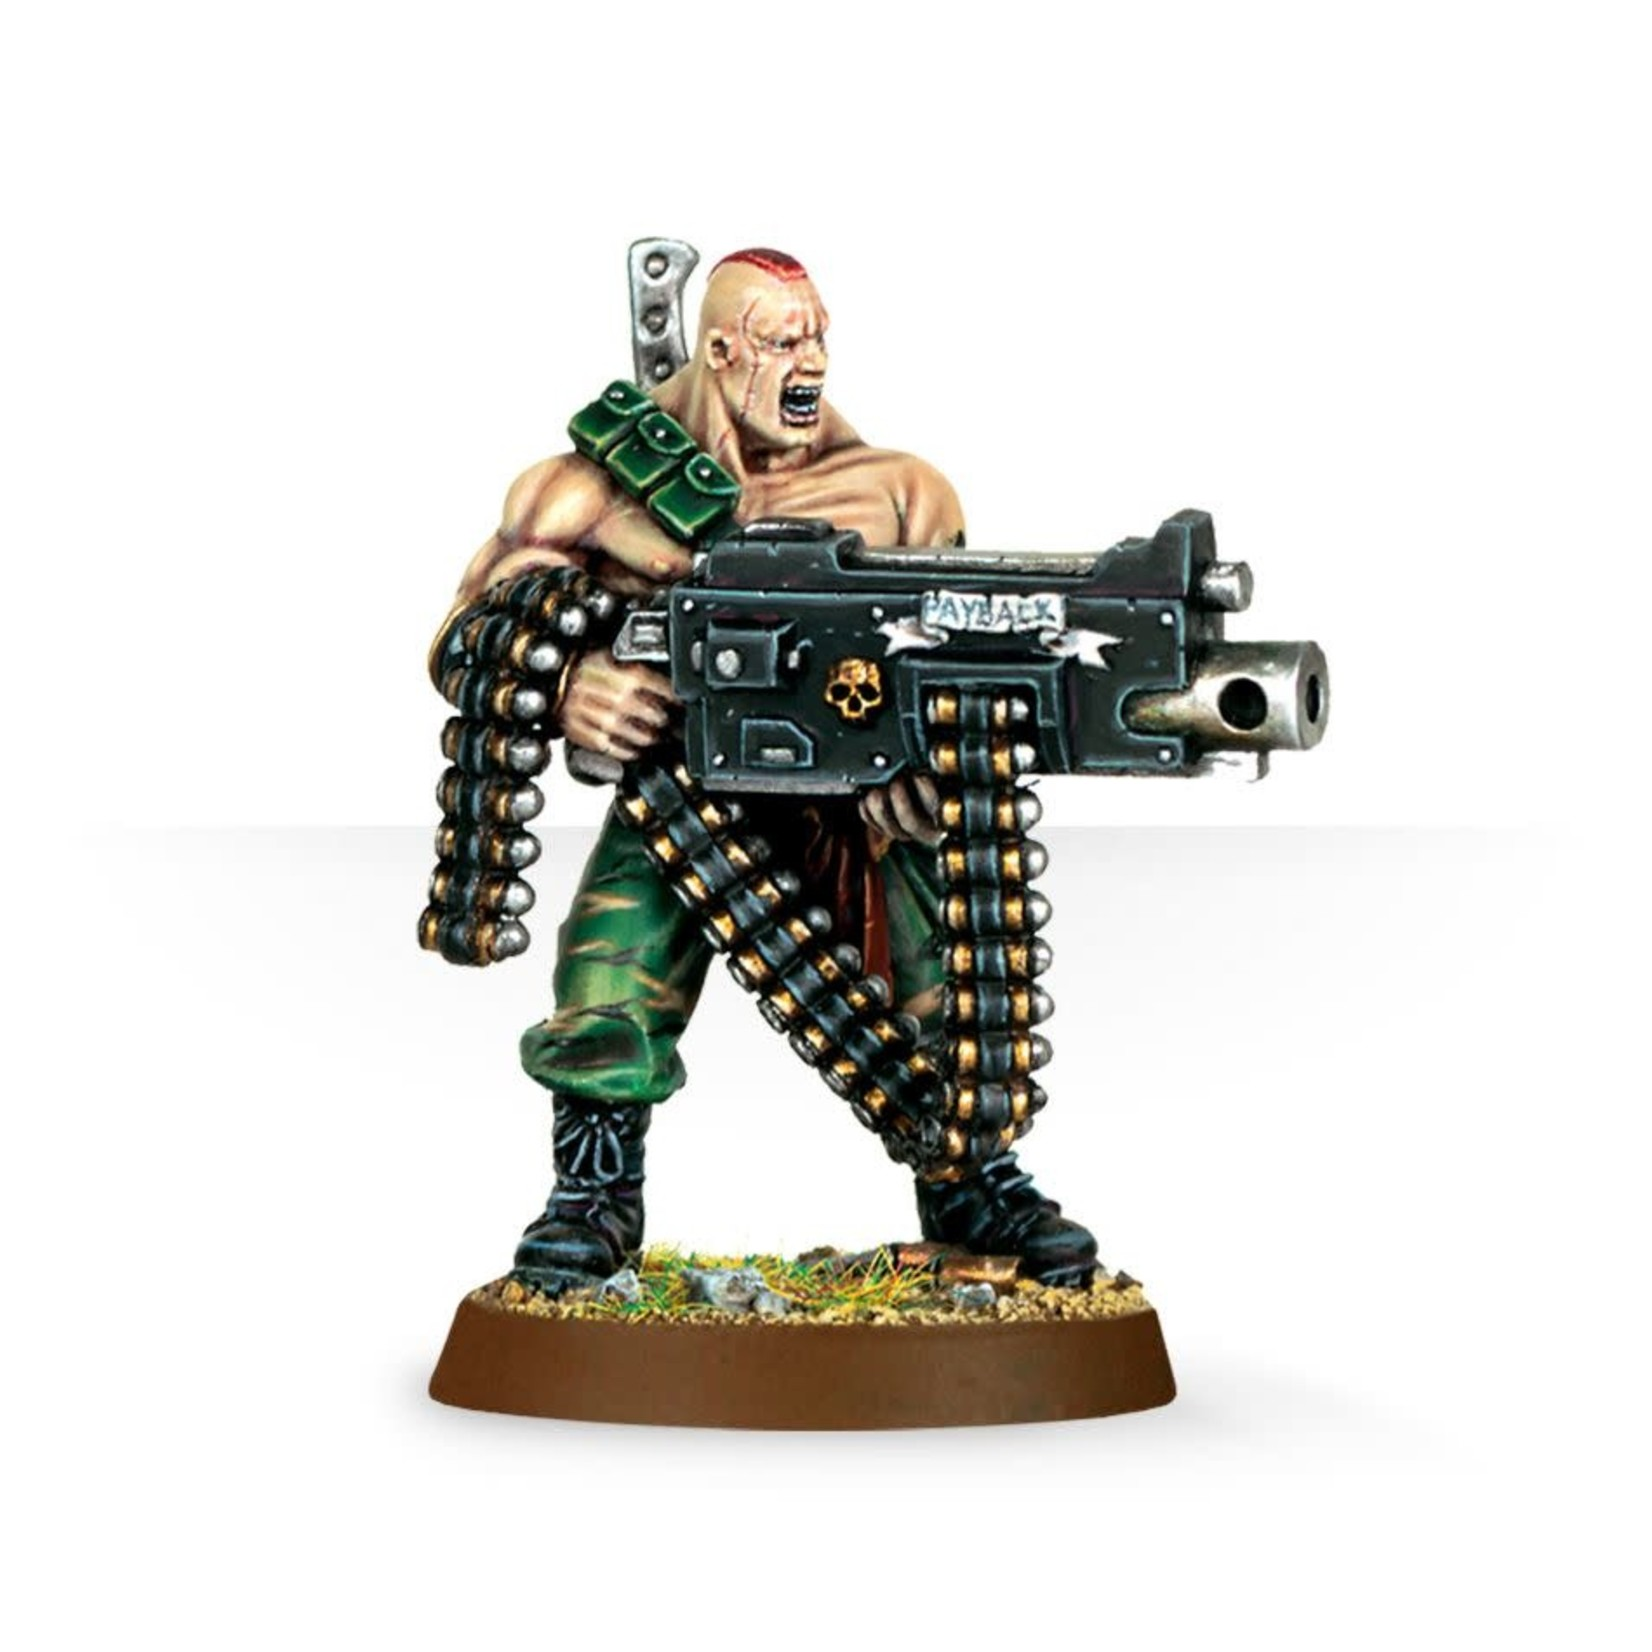 Games Workshop Gunnery Sergeant Harker